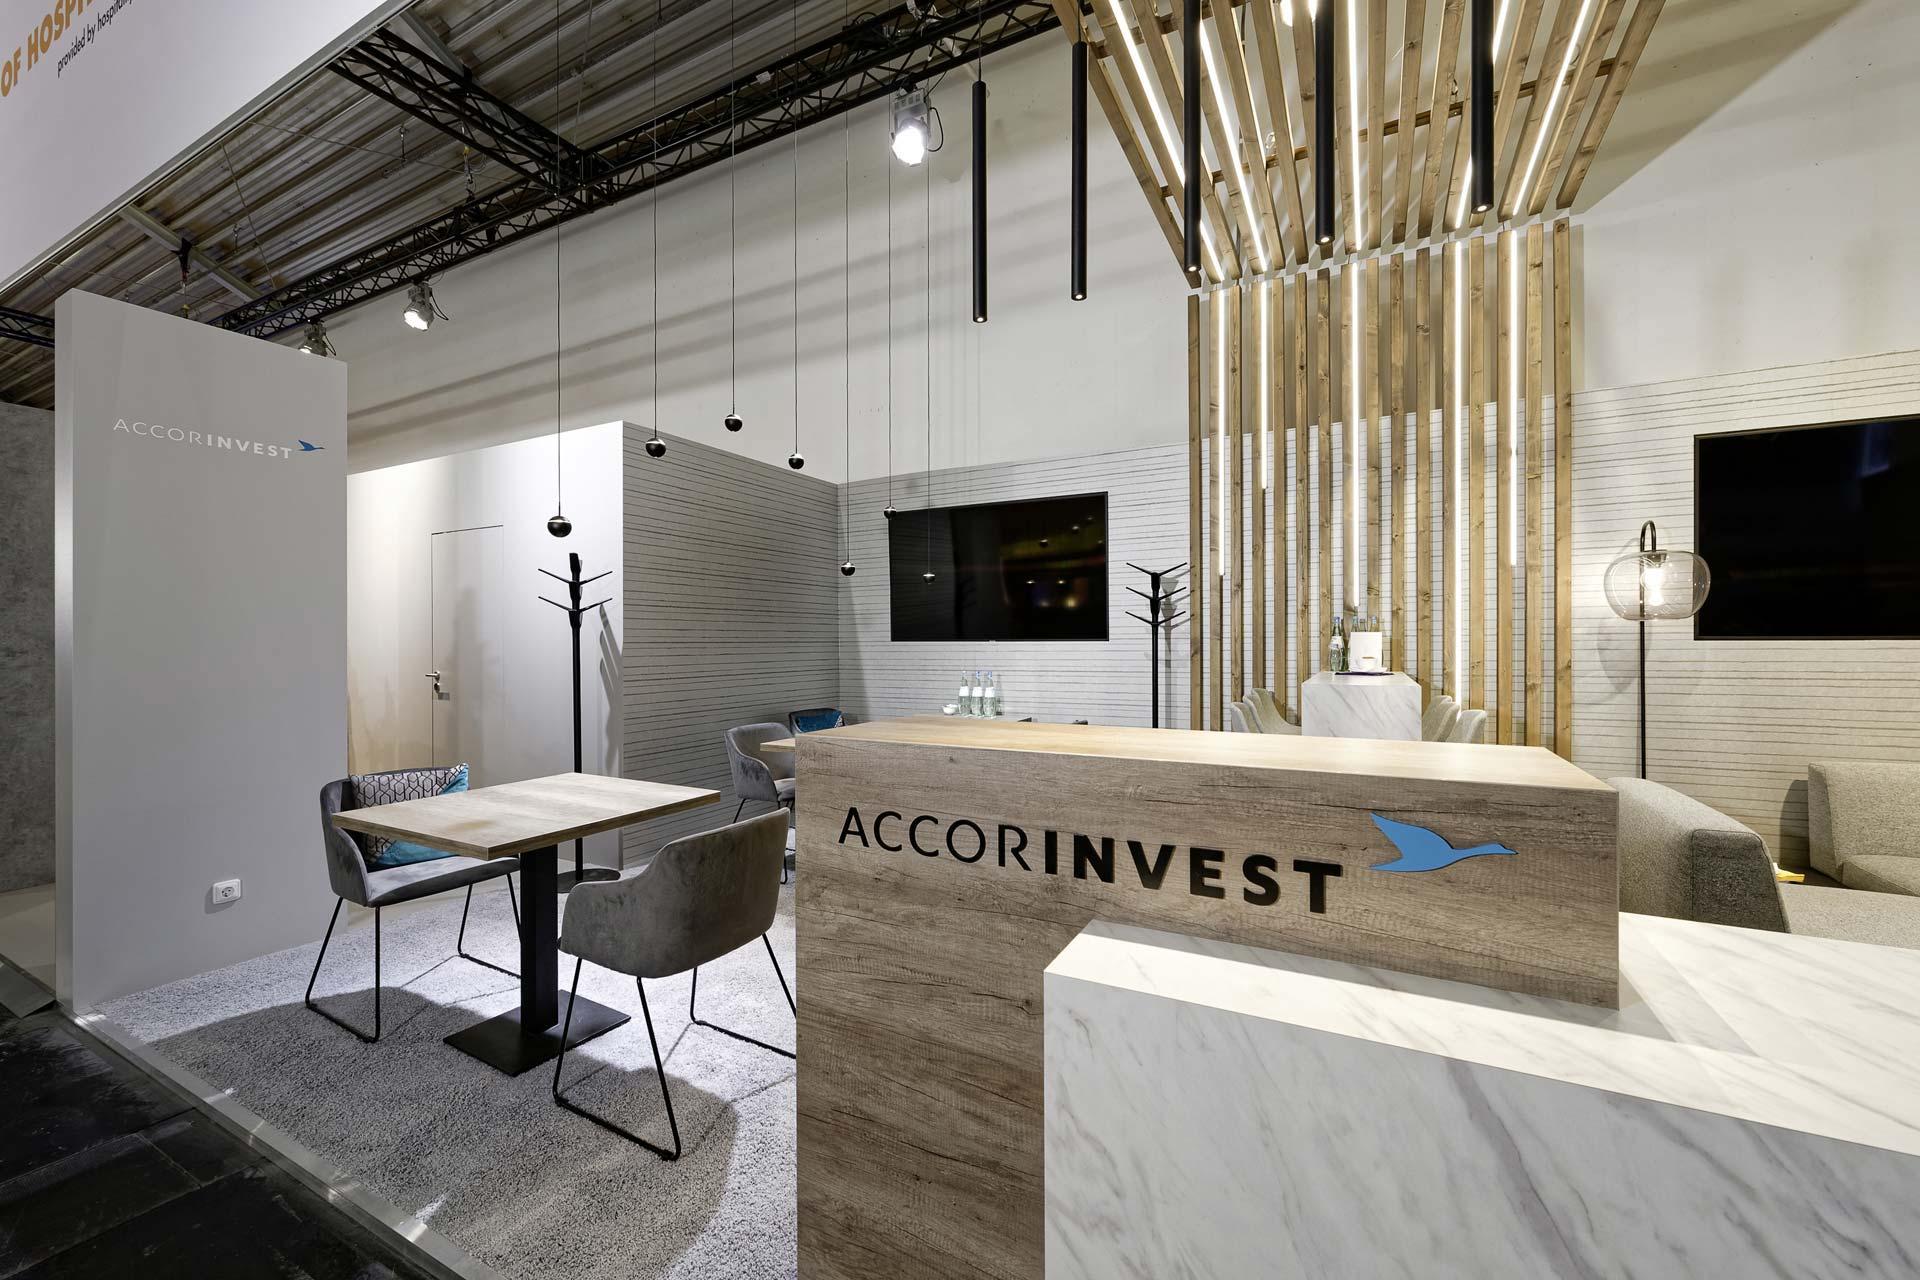 accorInvest_messestand_03